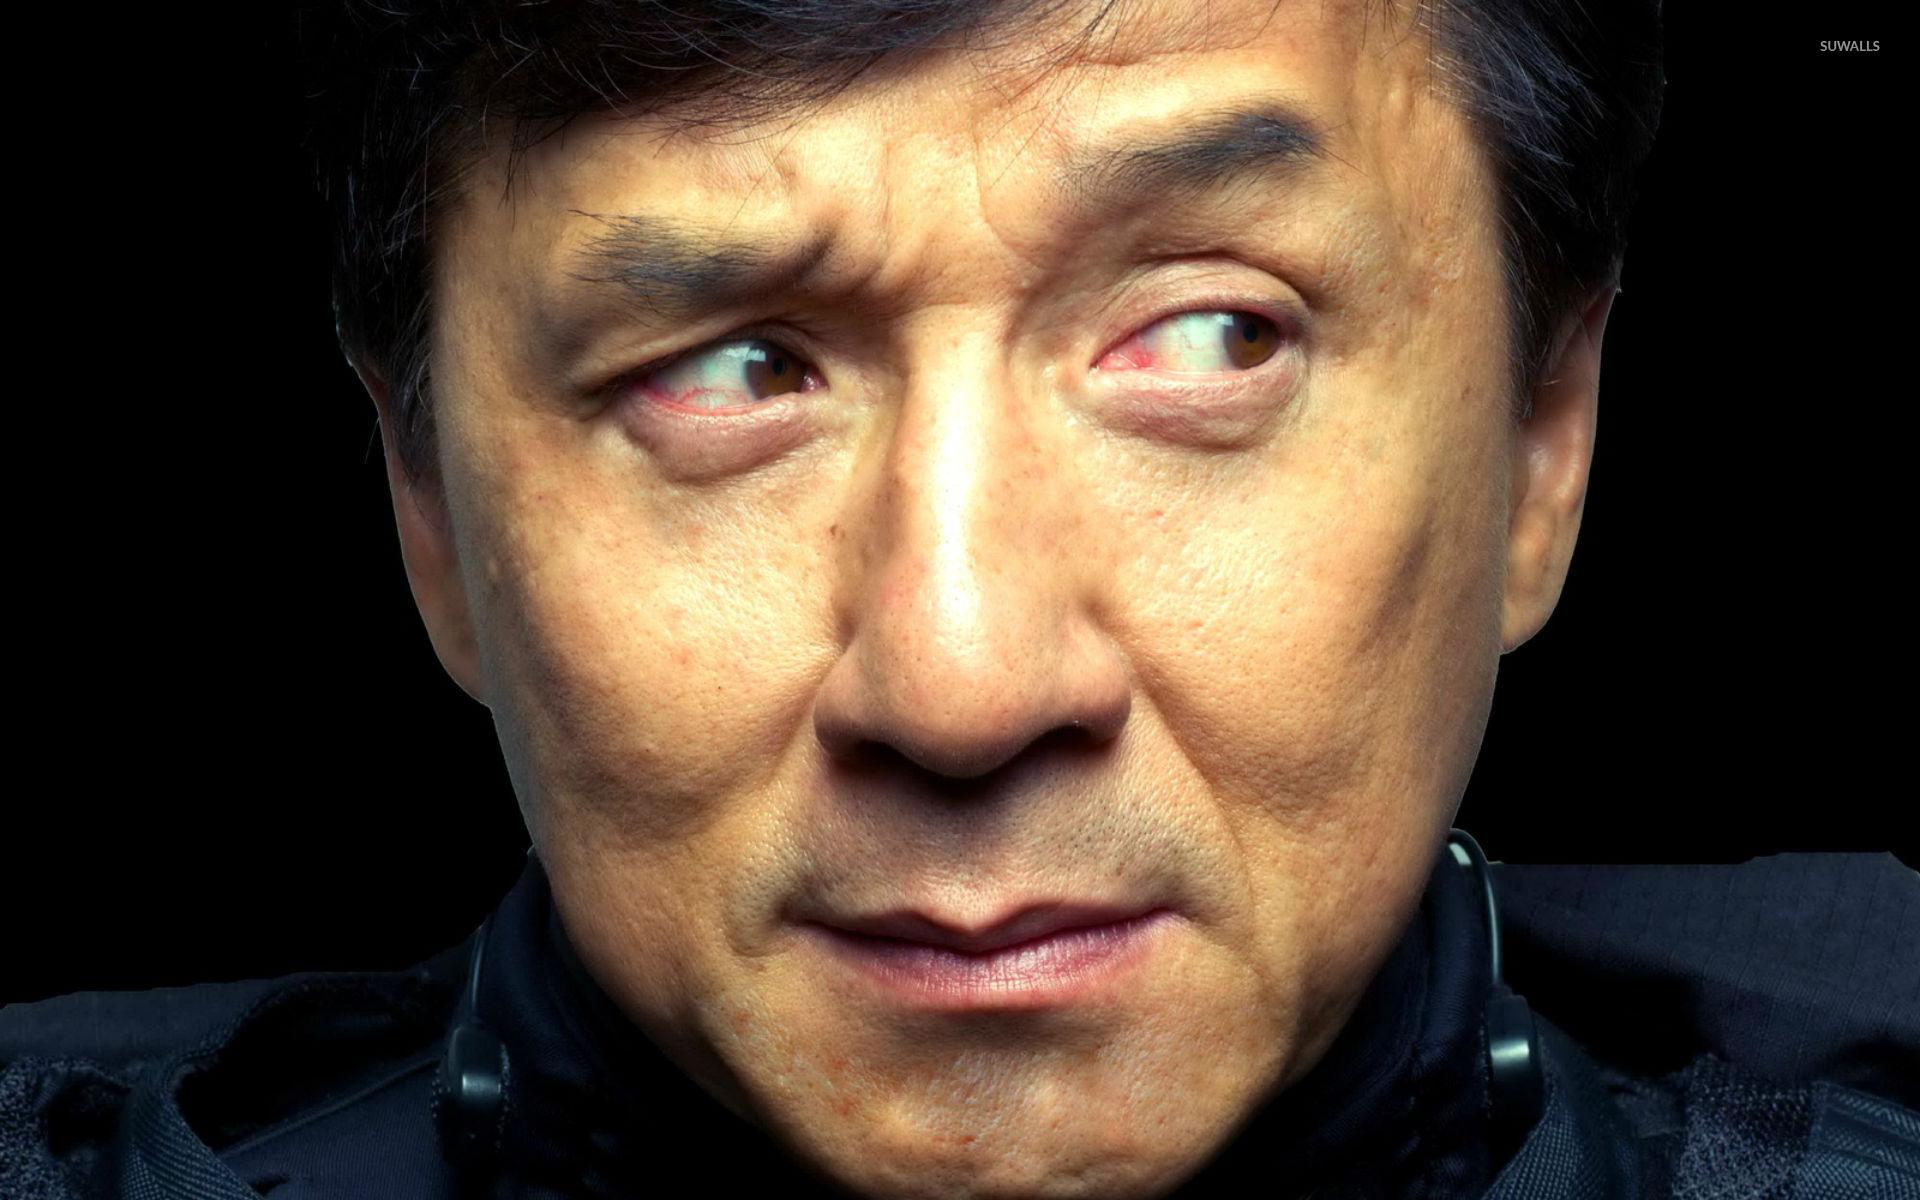 Jackie Chan 2 Wallpaper Male Celebrity Wallpapers 46371